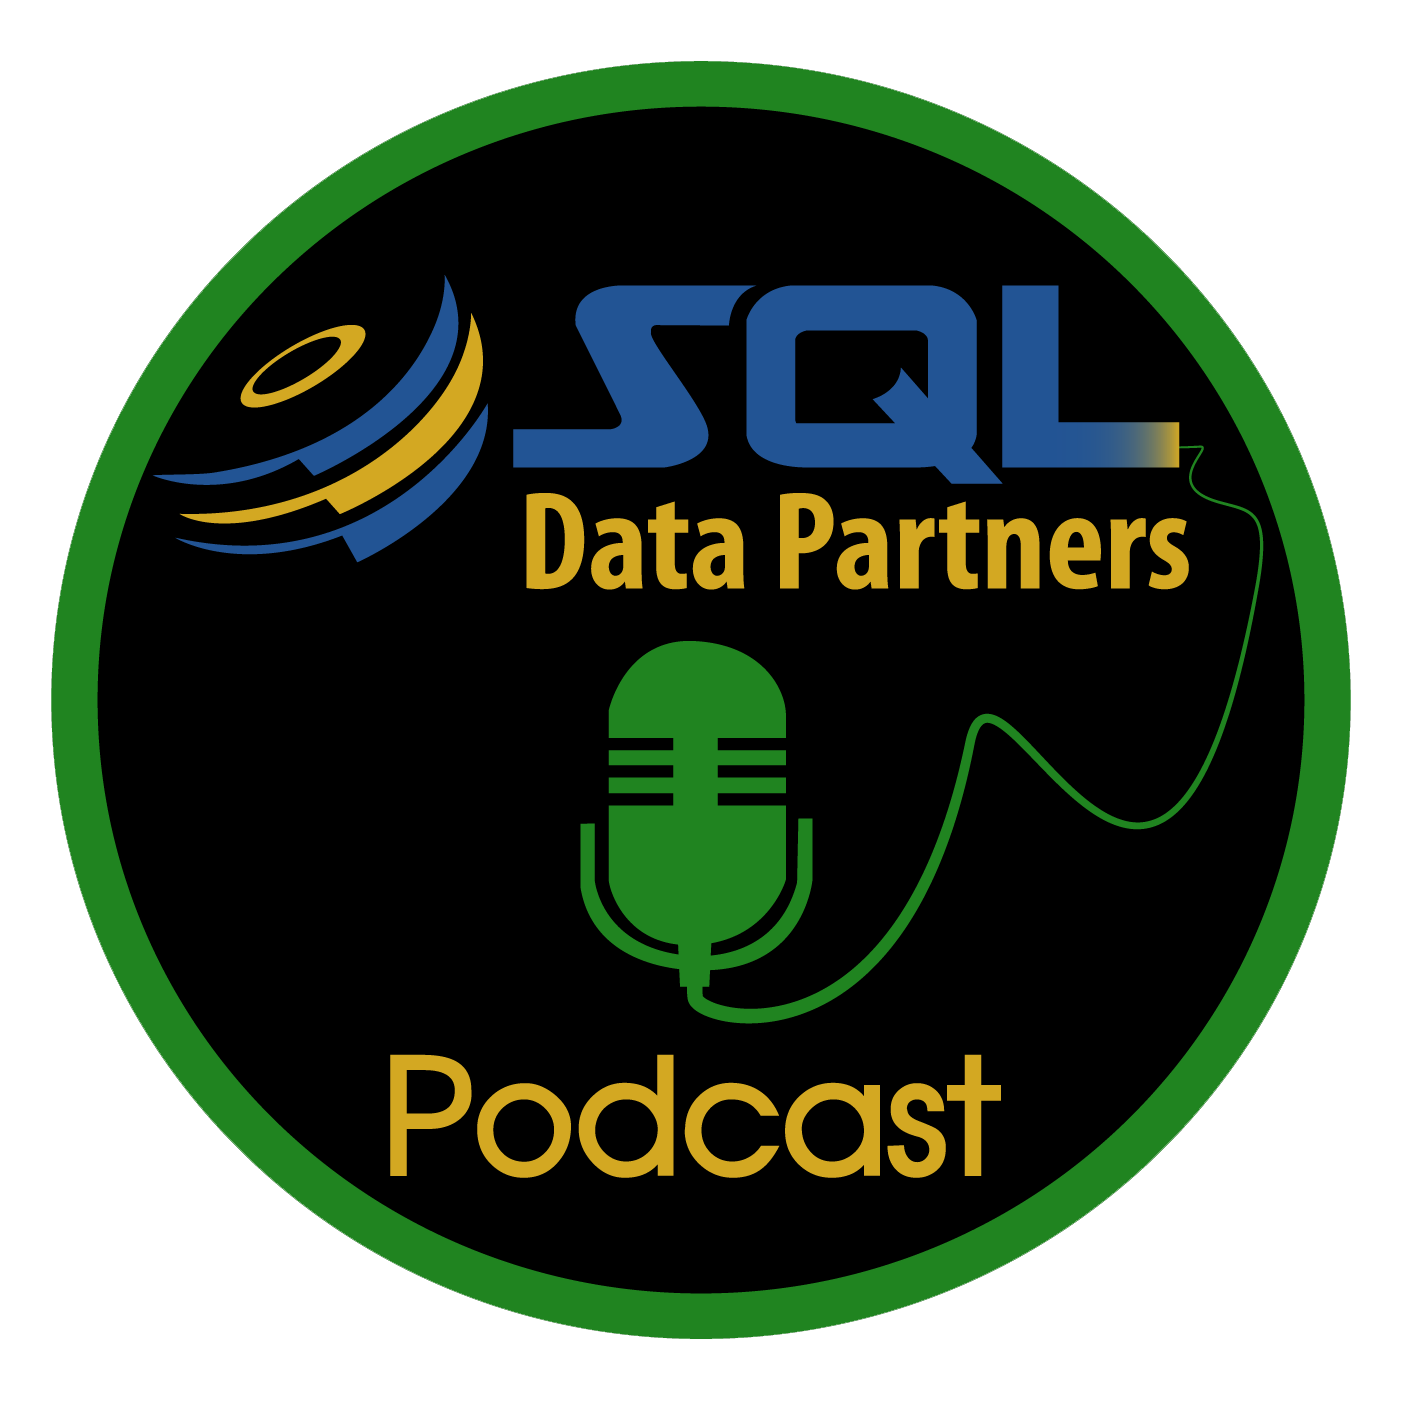 SQL Data Partners Podcast show art